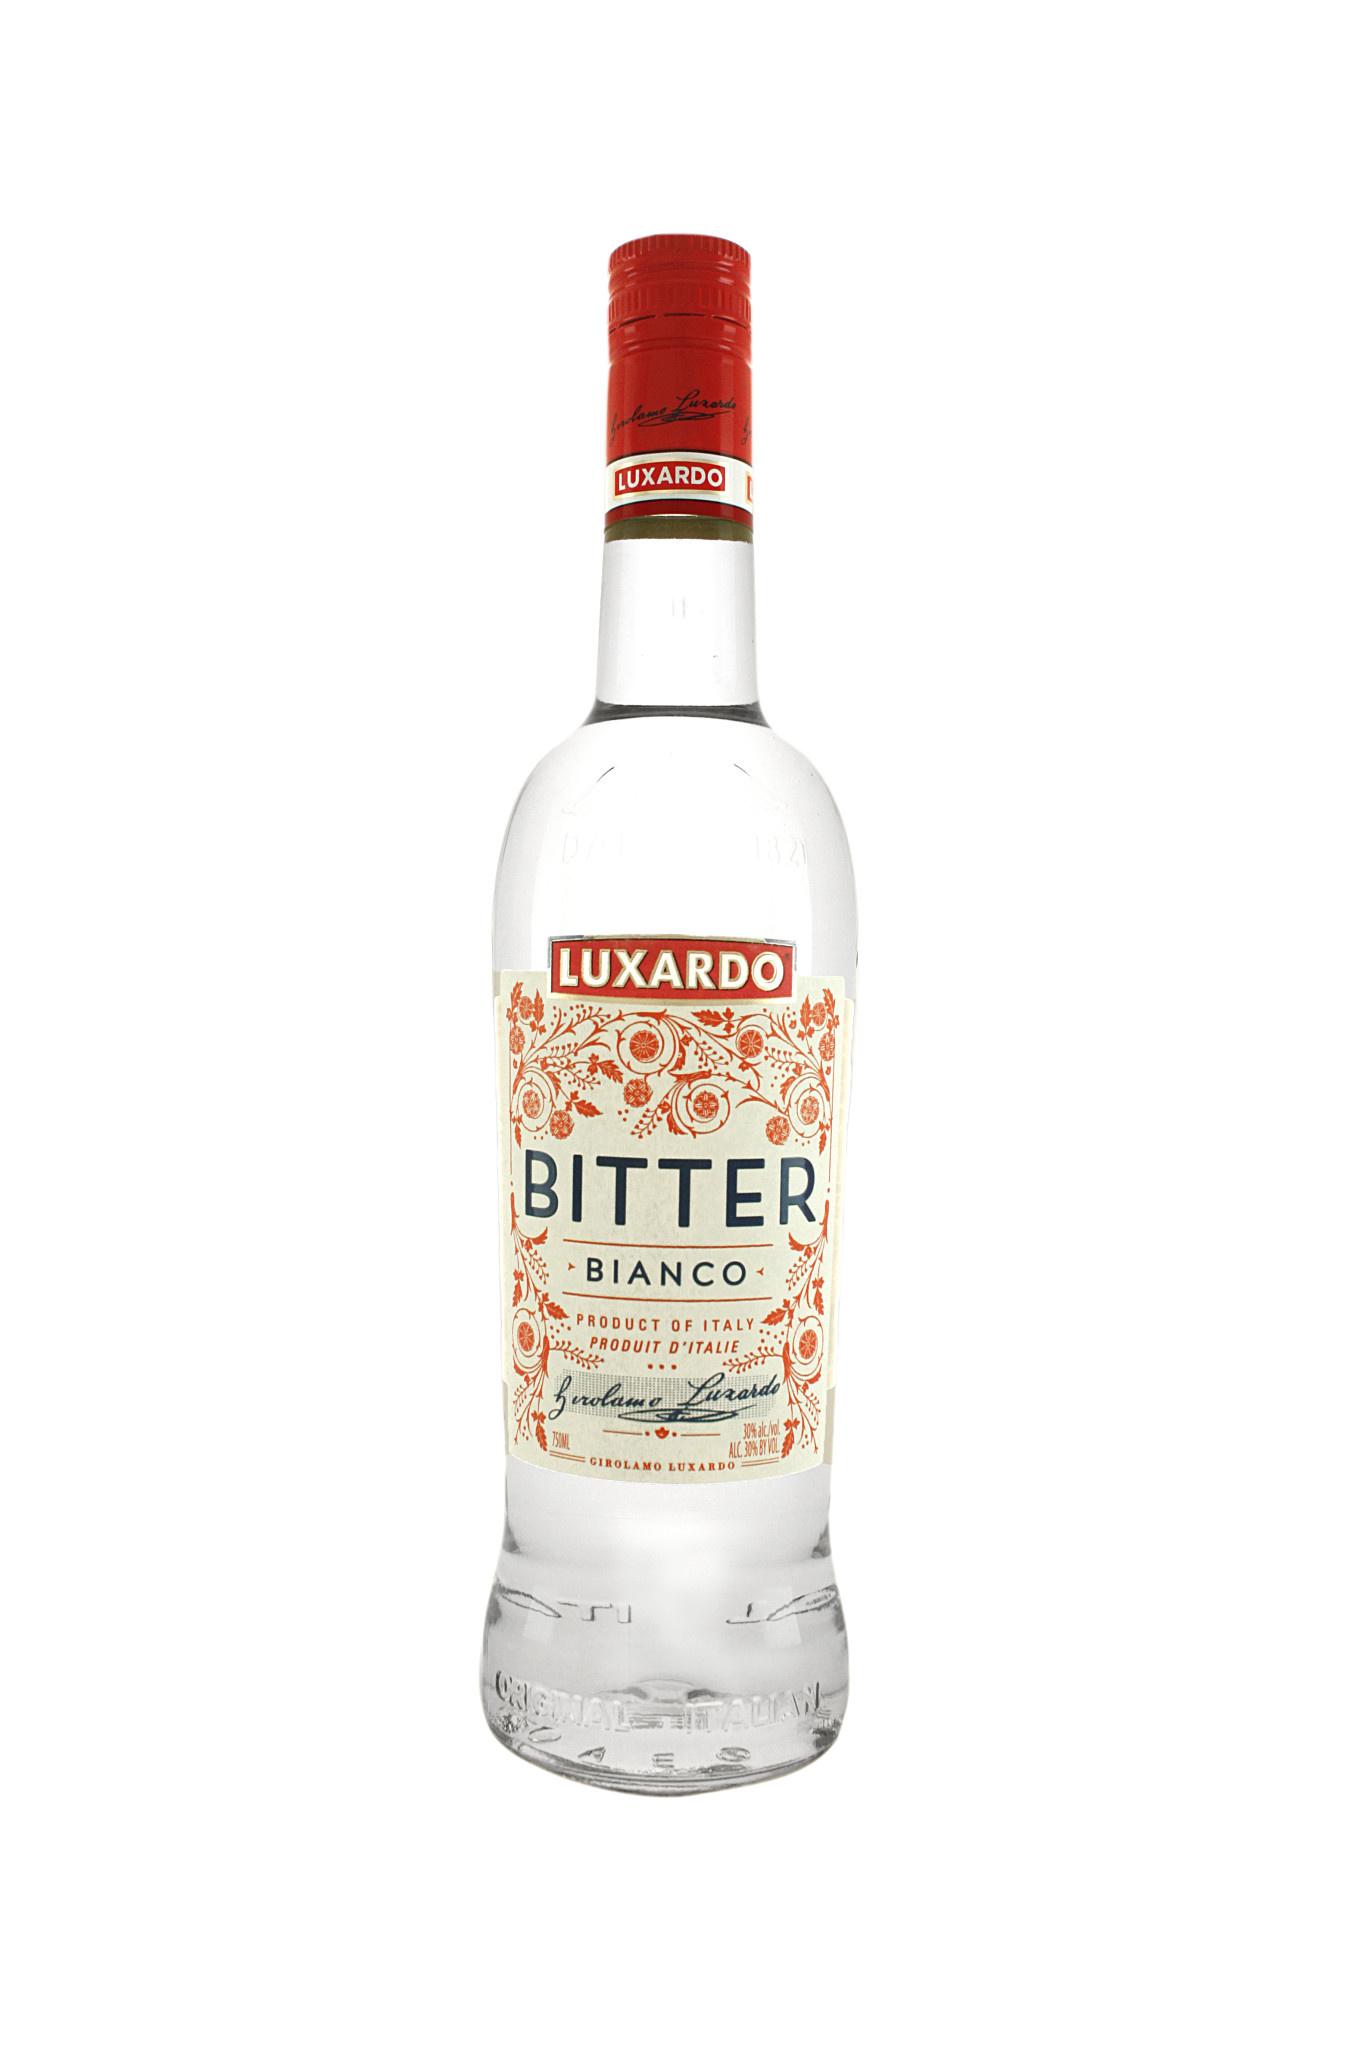 Luxardo Bitter Bianco Liqueur